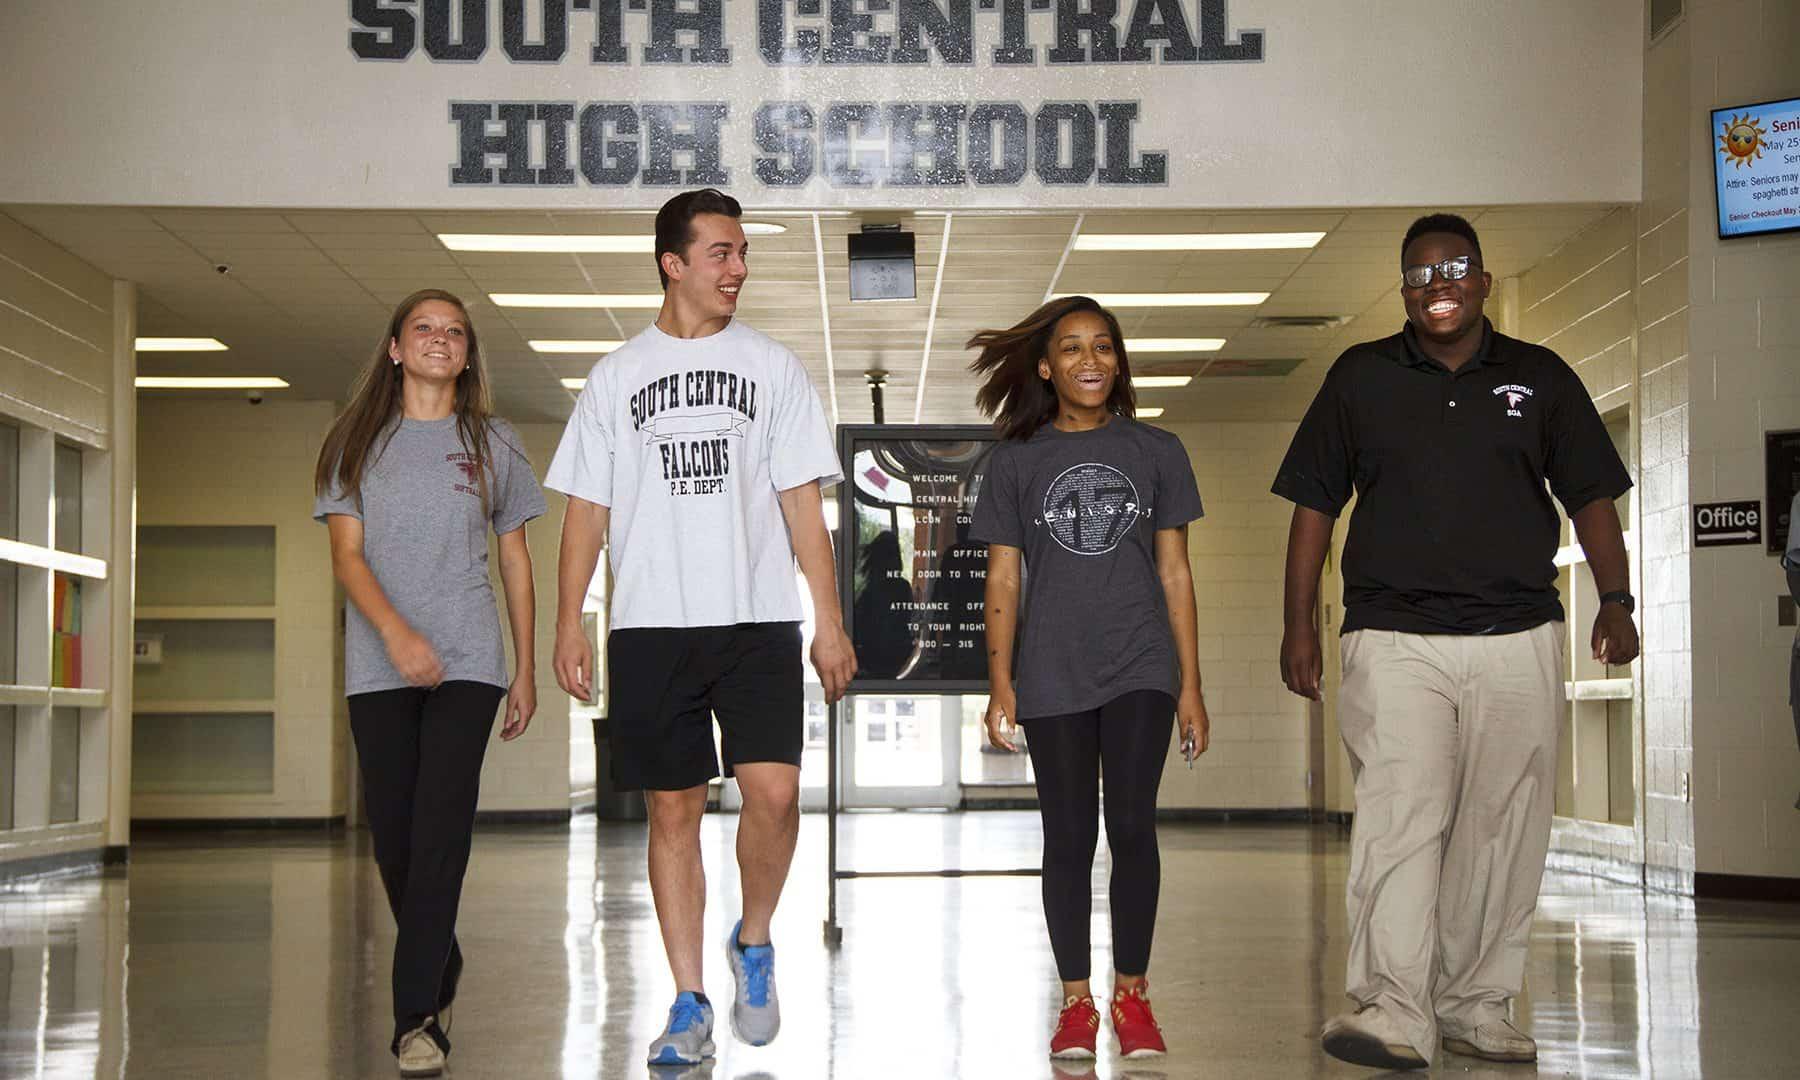 High School students walking in hallway